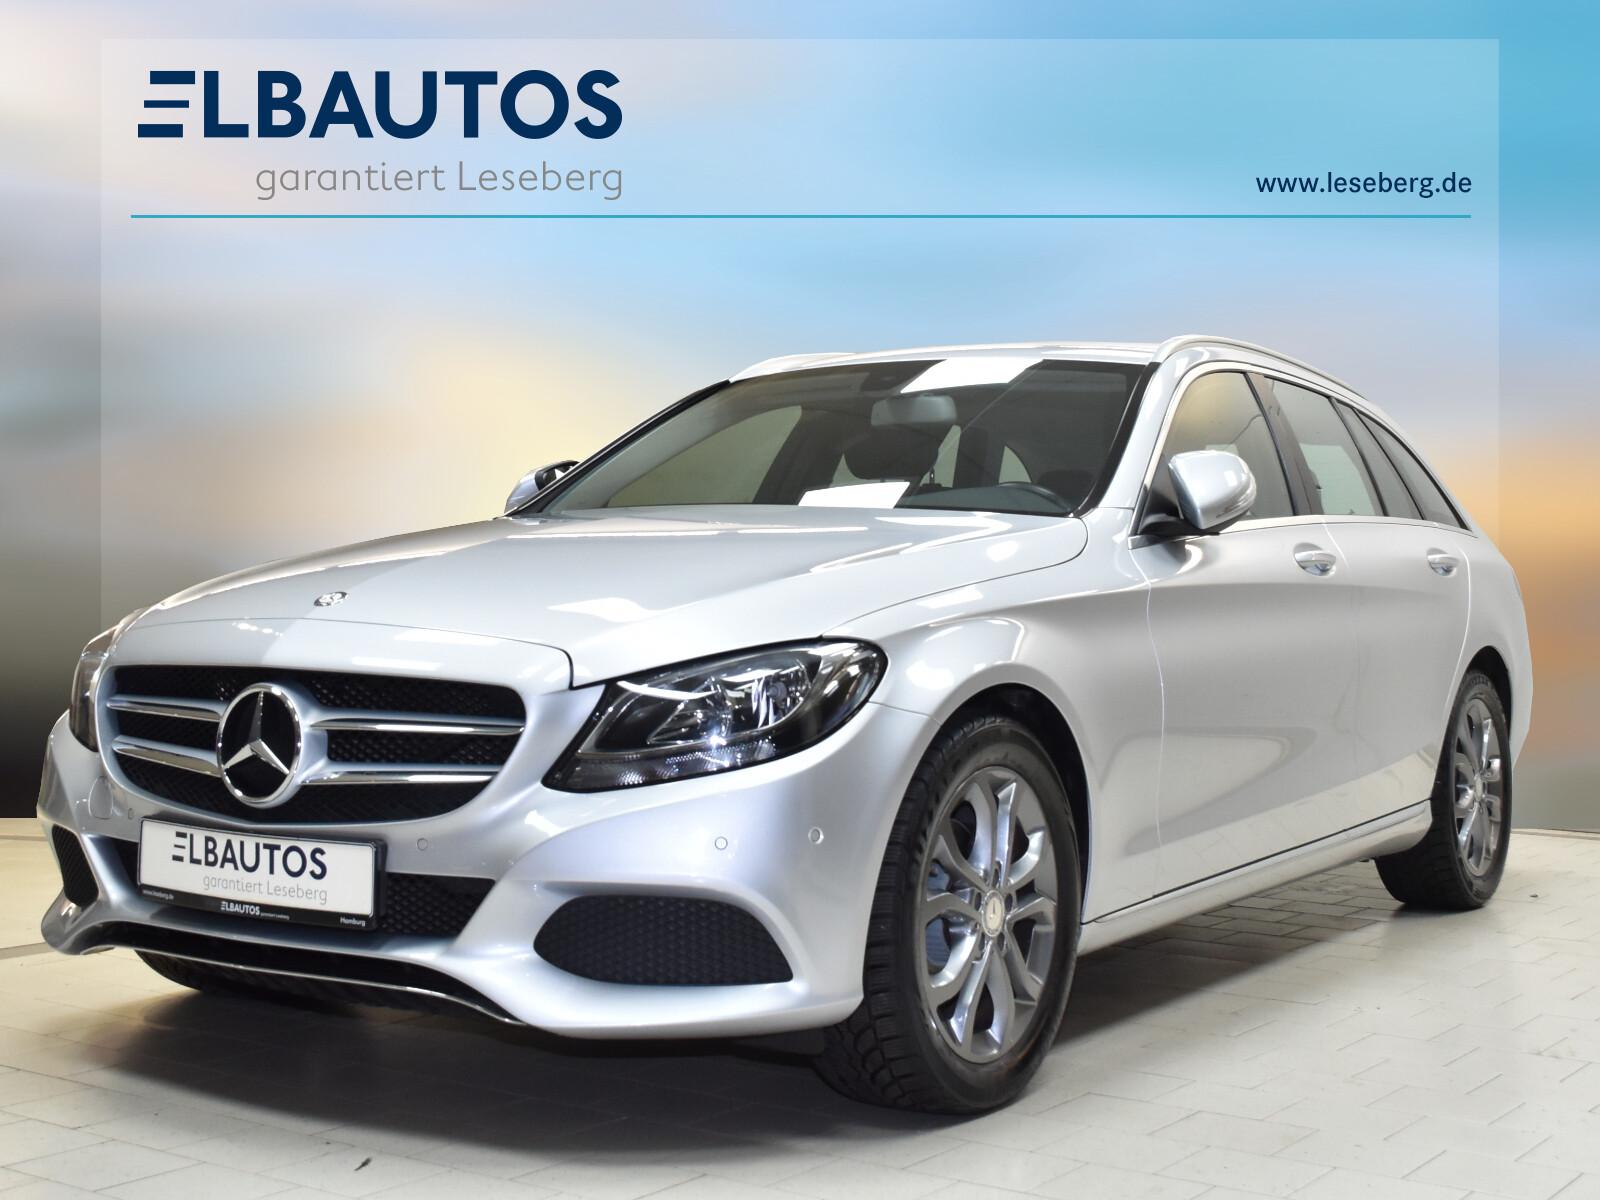 Mercedes-Benz C 180 T Avantgarde/6-Gang/Navi/EPH/SHZ/Tempomat, Jahr 2014, Benzin